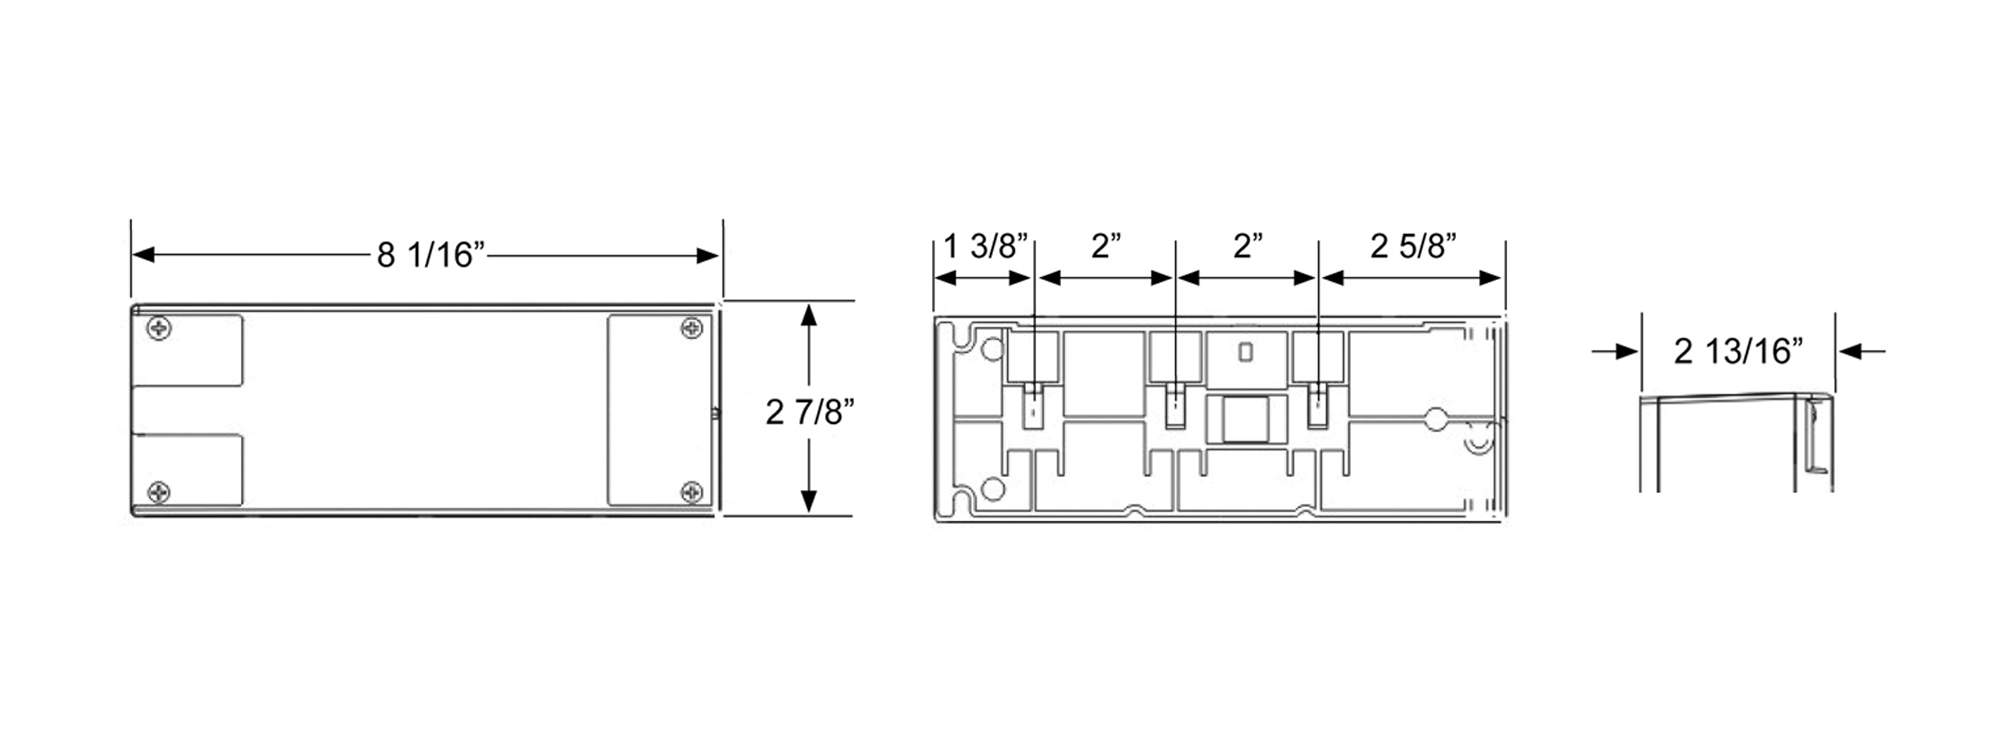 c6285 incandescent trailer light kits